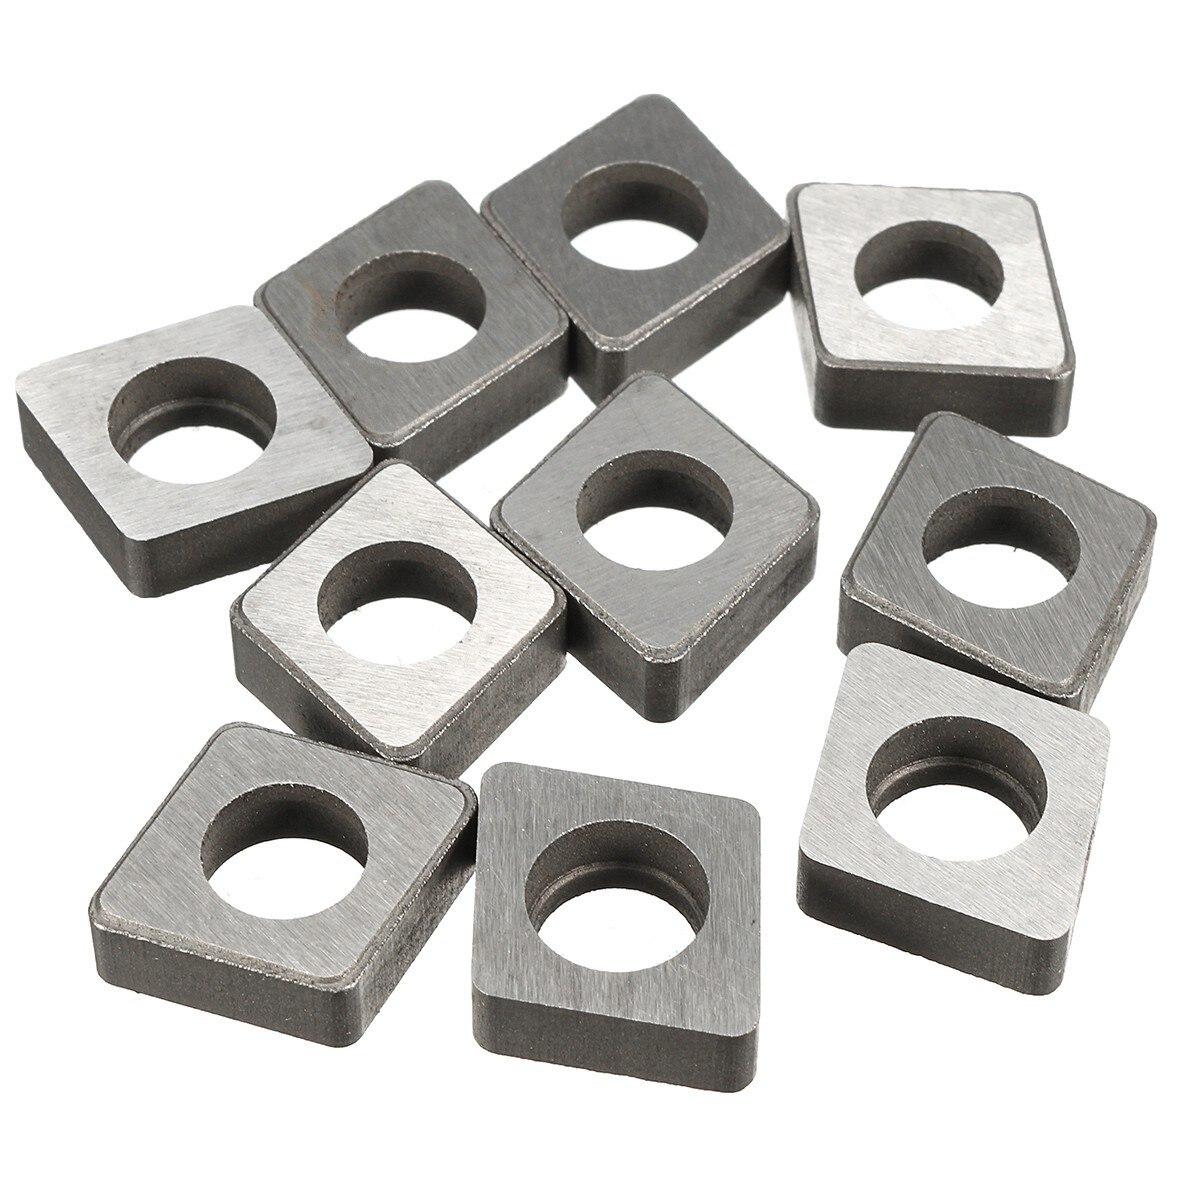 10pcs  CTM510  Carbide Insert Shim Seats Tightening screw